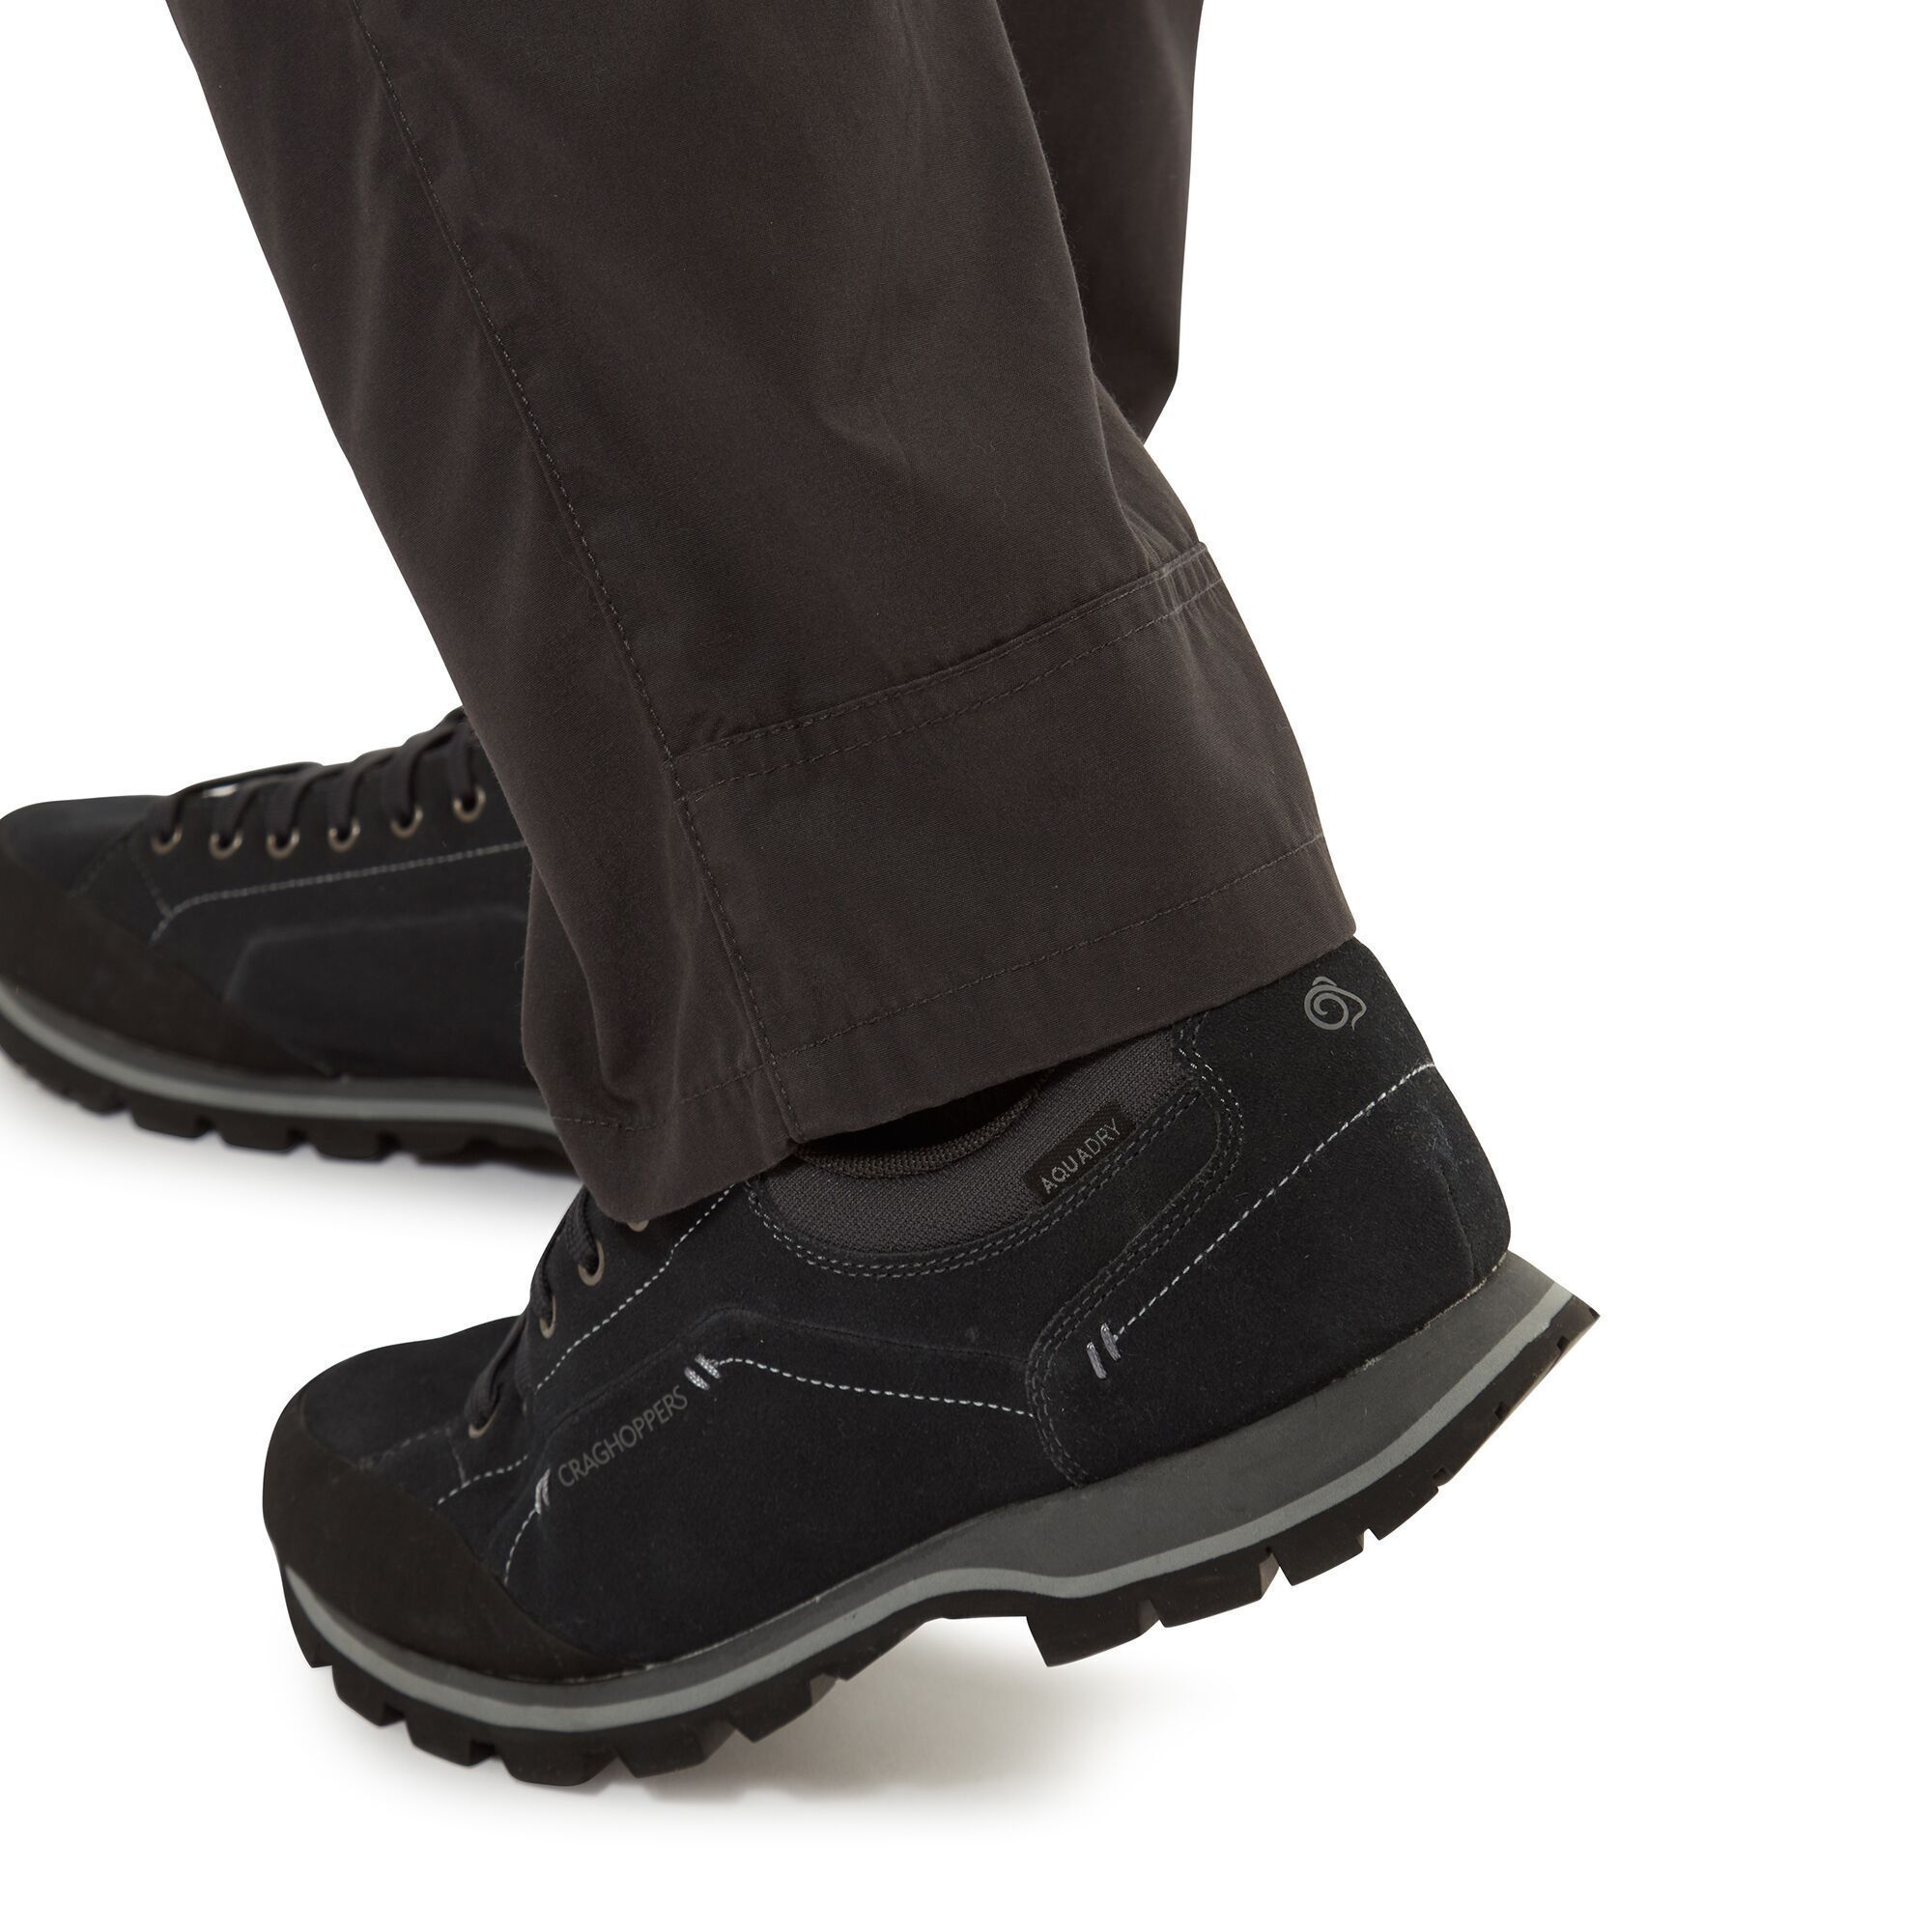 Craghoppers Mens Kiwi Boulder Slim Trousers (Black Pepper)